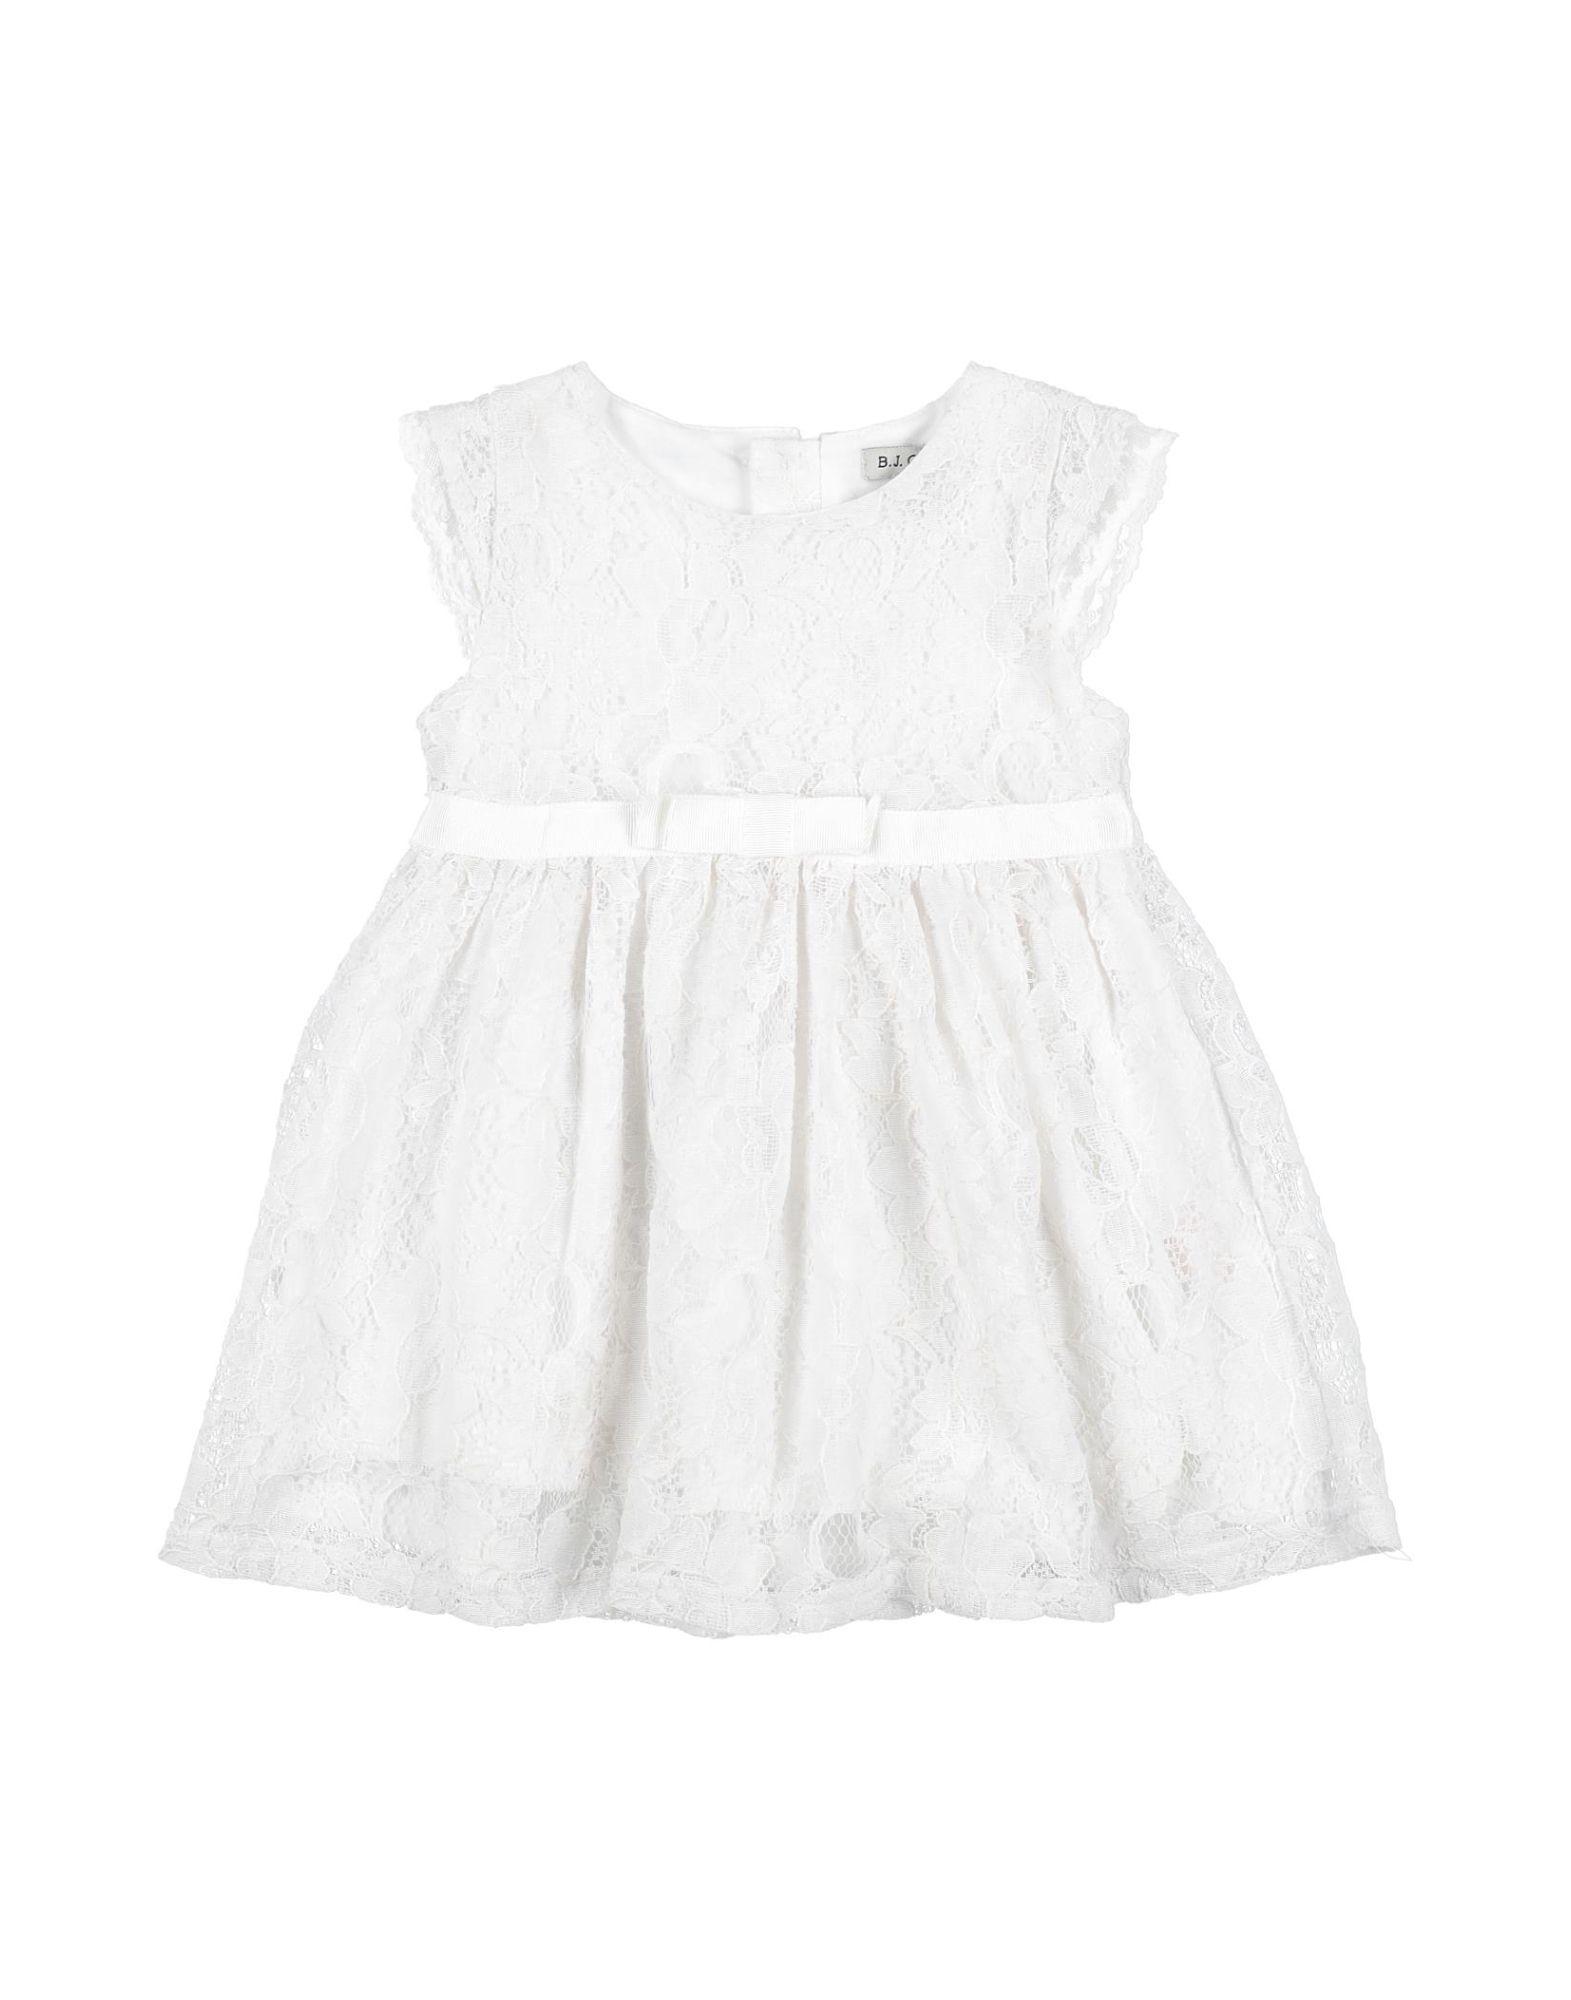 B.j.charles Kids' Dresses In White